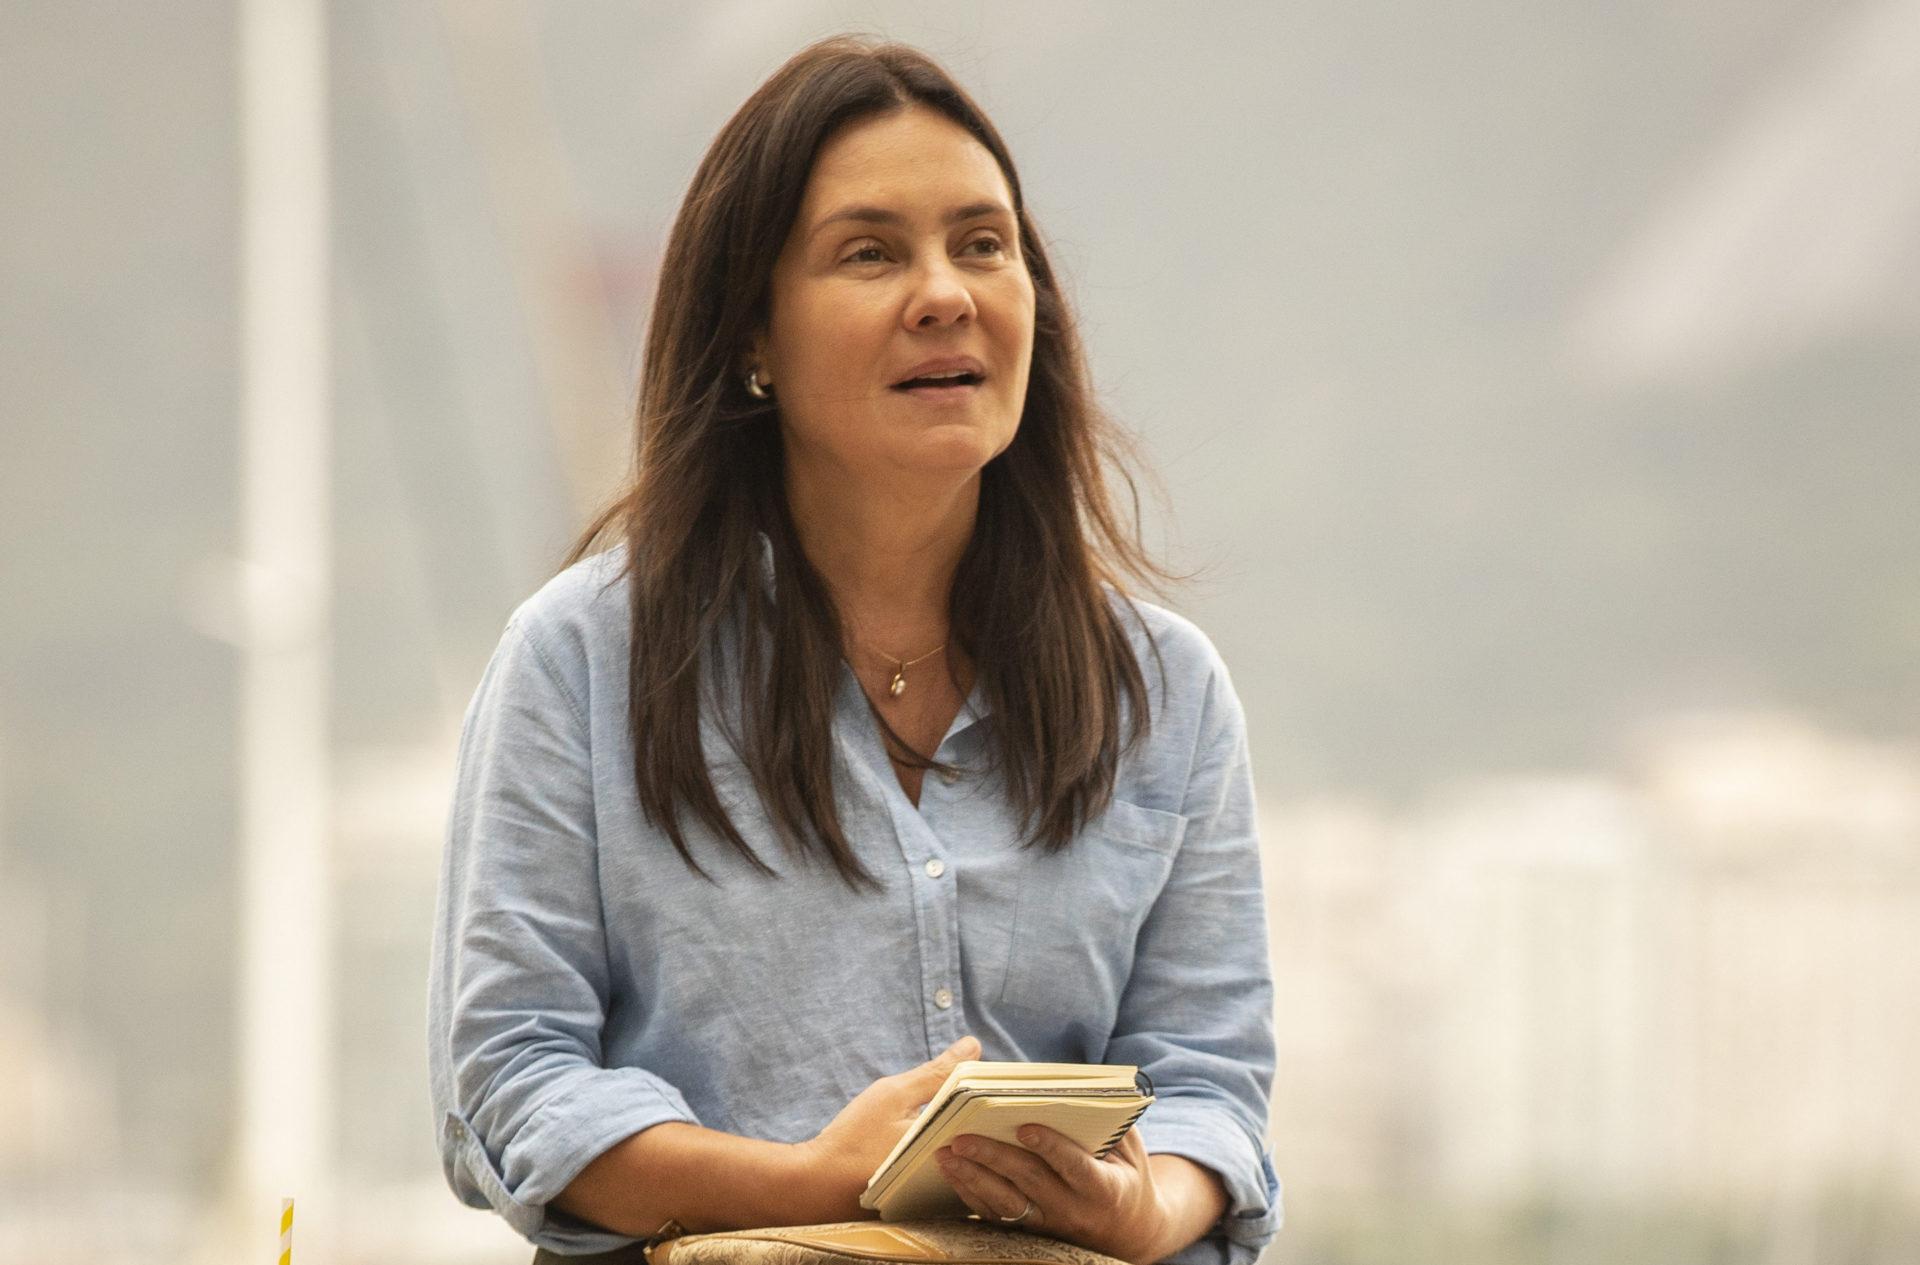 Thelma (Adriana Esteves) de Amor de Mãe